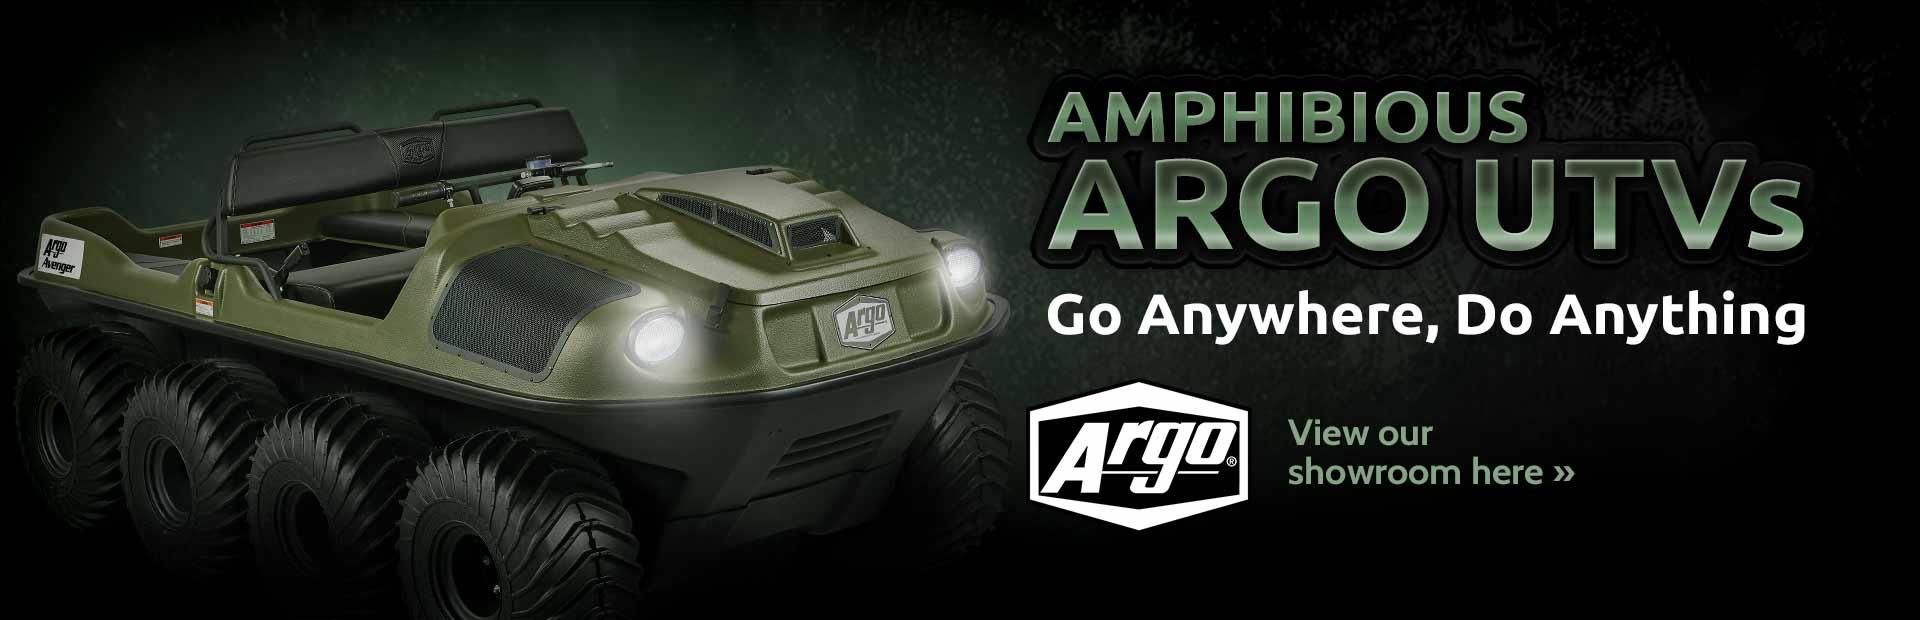 Click here to view Argo UTVs.